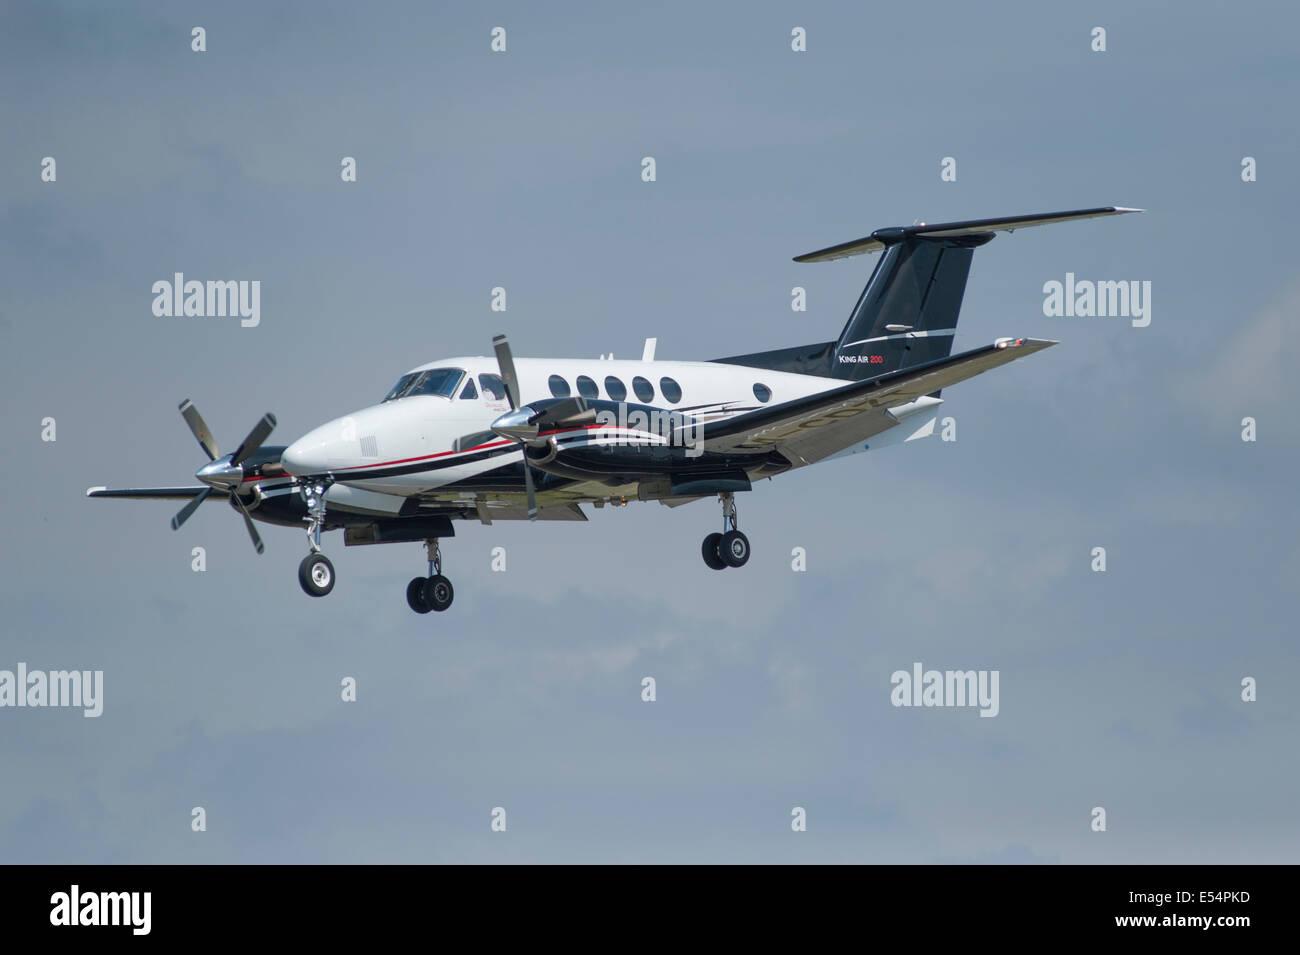 Raytheon B200 King Air landing at Farnborough Airport - Stock Image